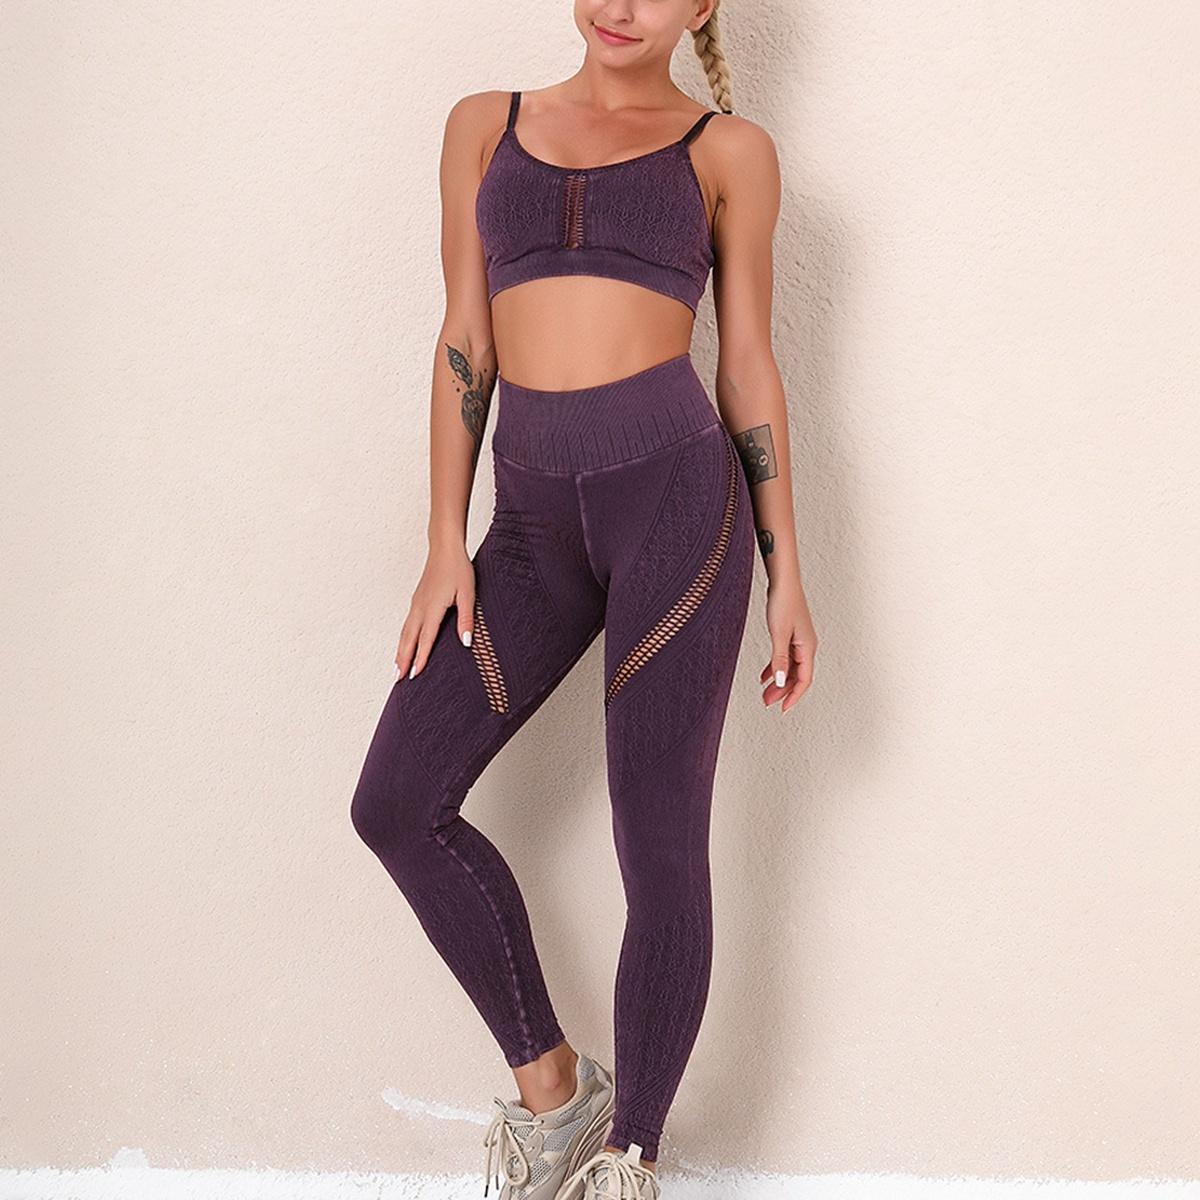 yoga suits (10)